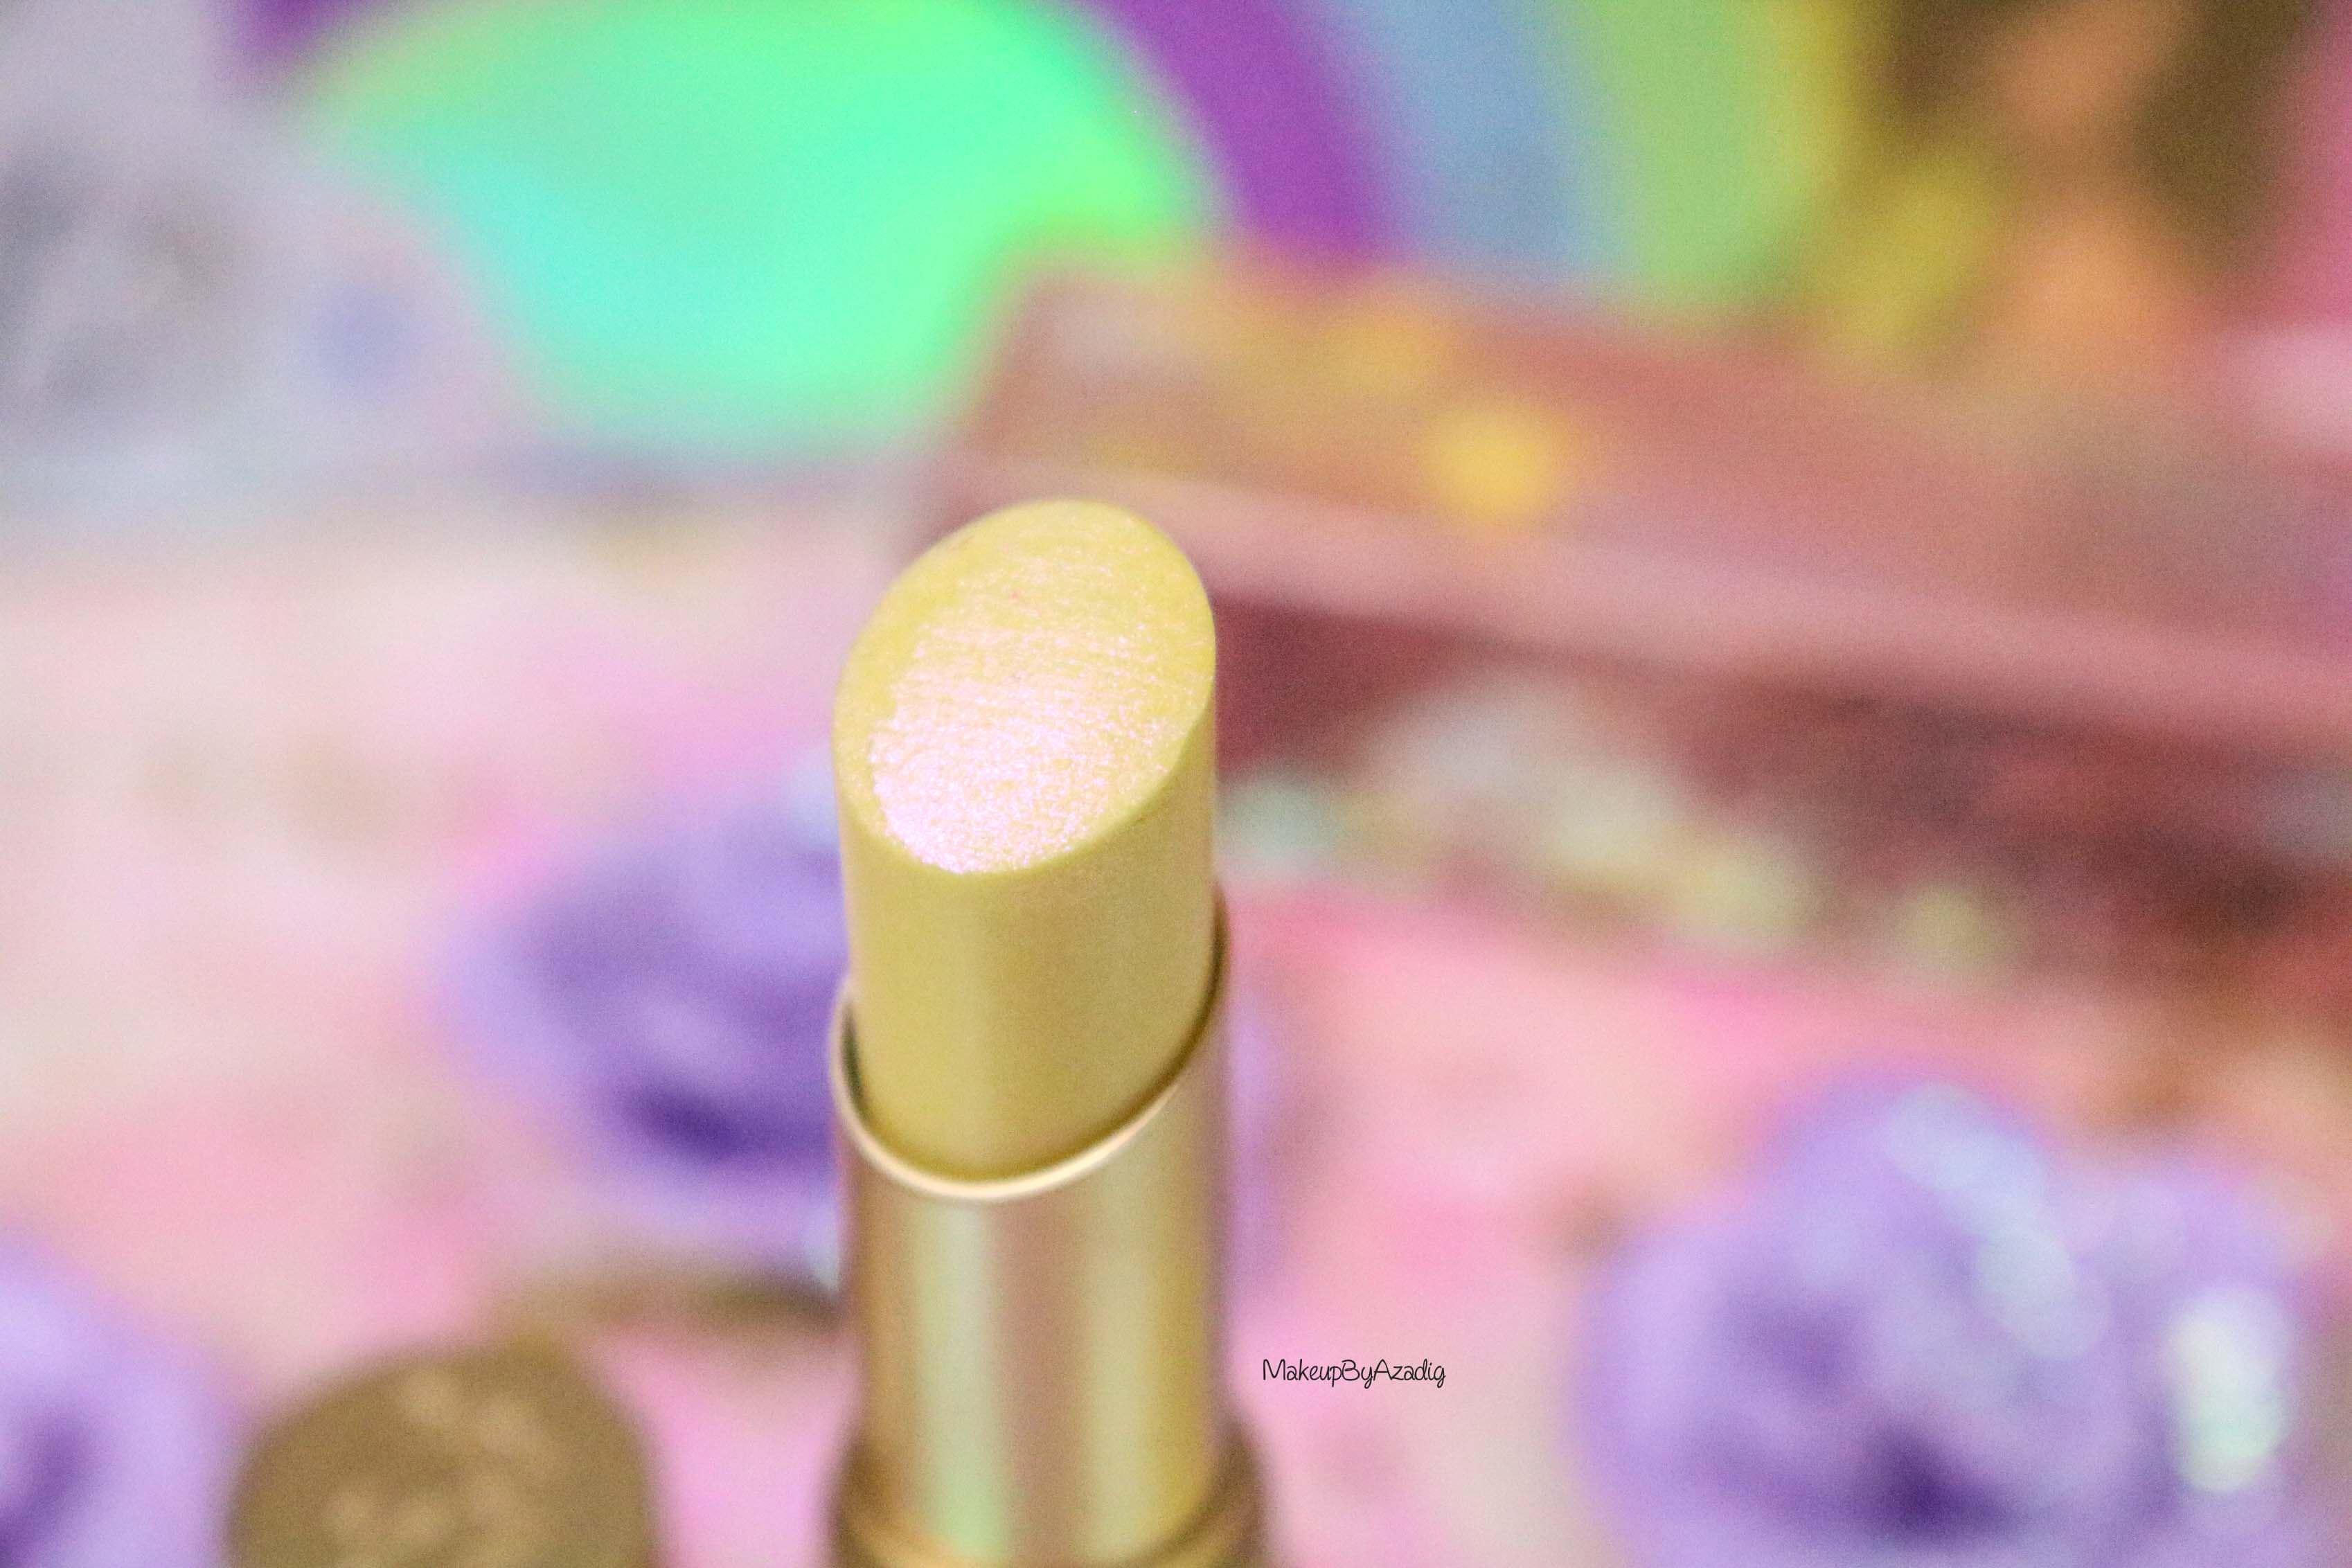 revue-review-mystical-lipstick-rouge-levres-magique-too-faced-avis-swatch-prix-france-makeupbyazadig-couleur